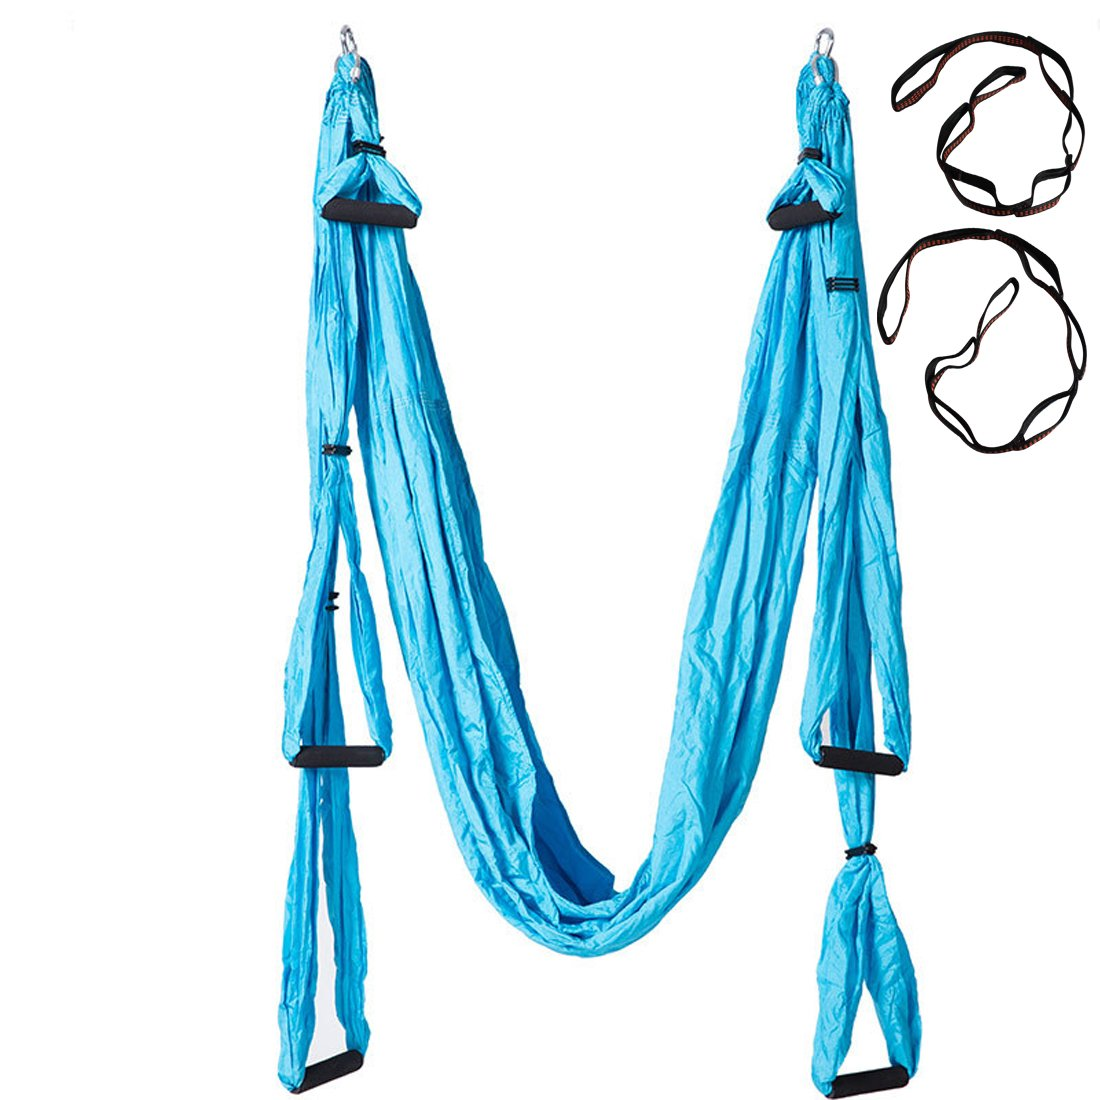 Suyi Hi Anti-Gravity Aerial Yoga Silks Hammock Flying Swing Yoga Pilates Set Kit Include Steel Carabiners Extension Straps